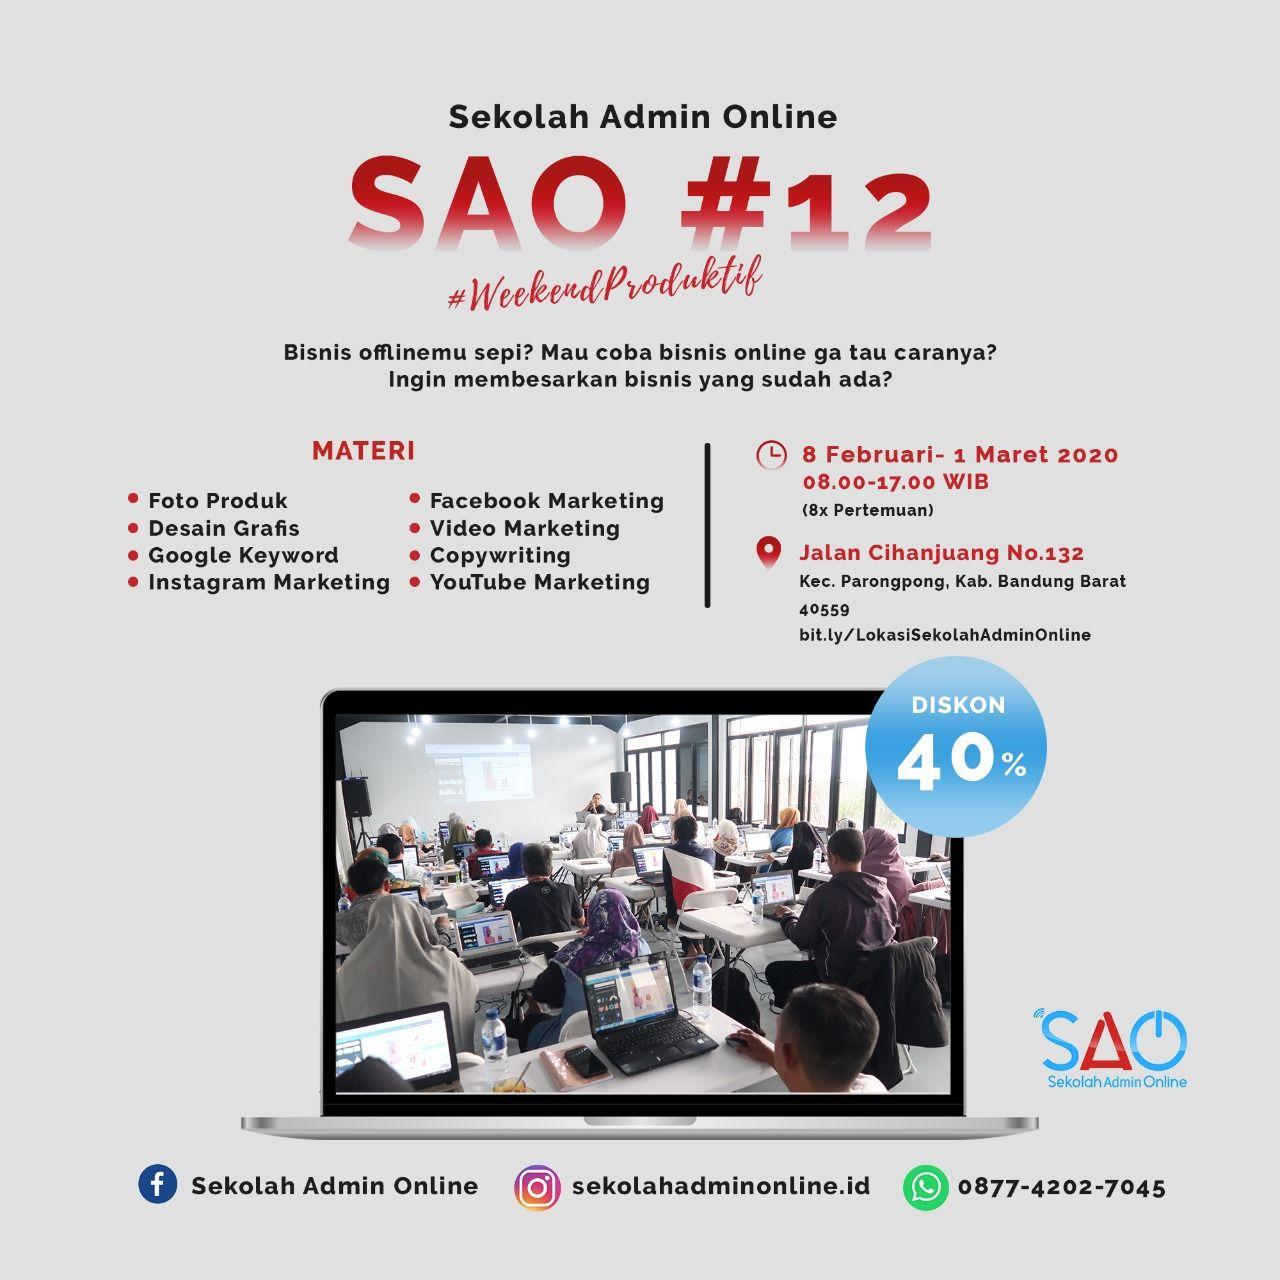 Sekolah Admin Online 12 Sekolah Desain Grafis Marketing